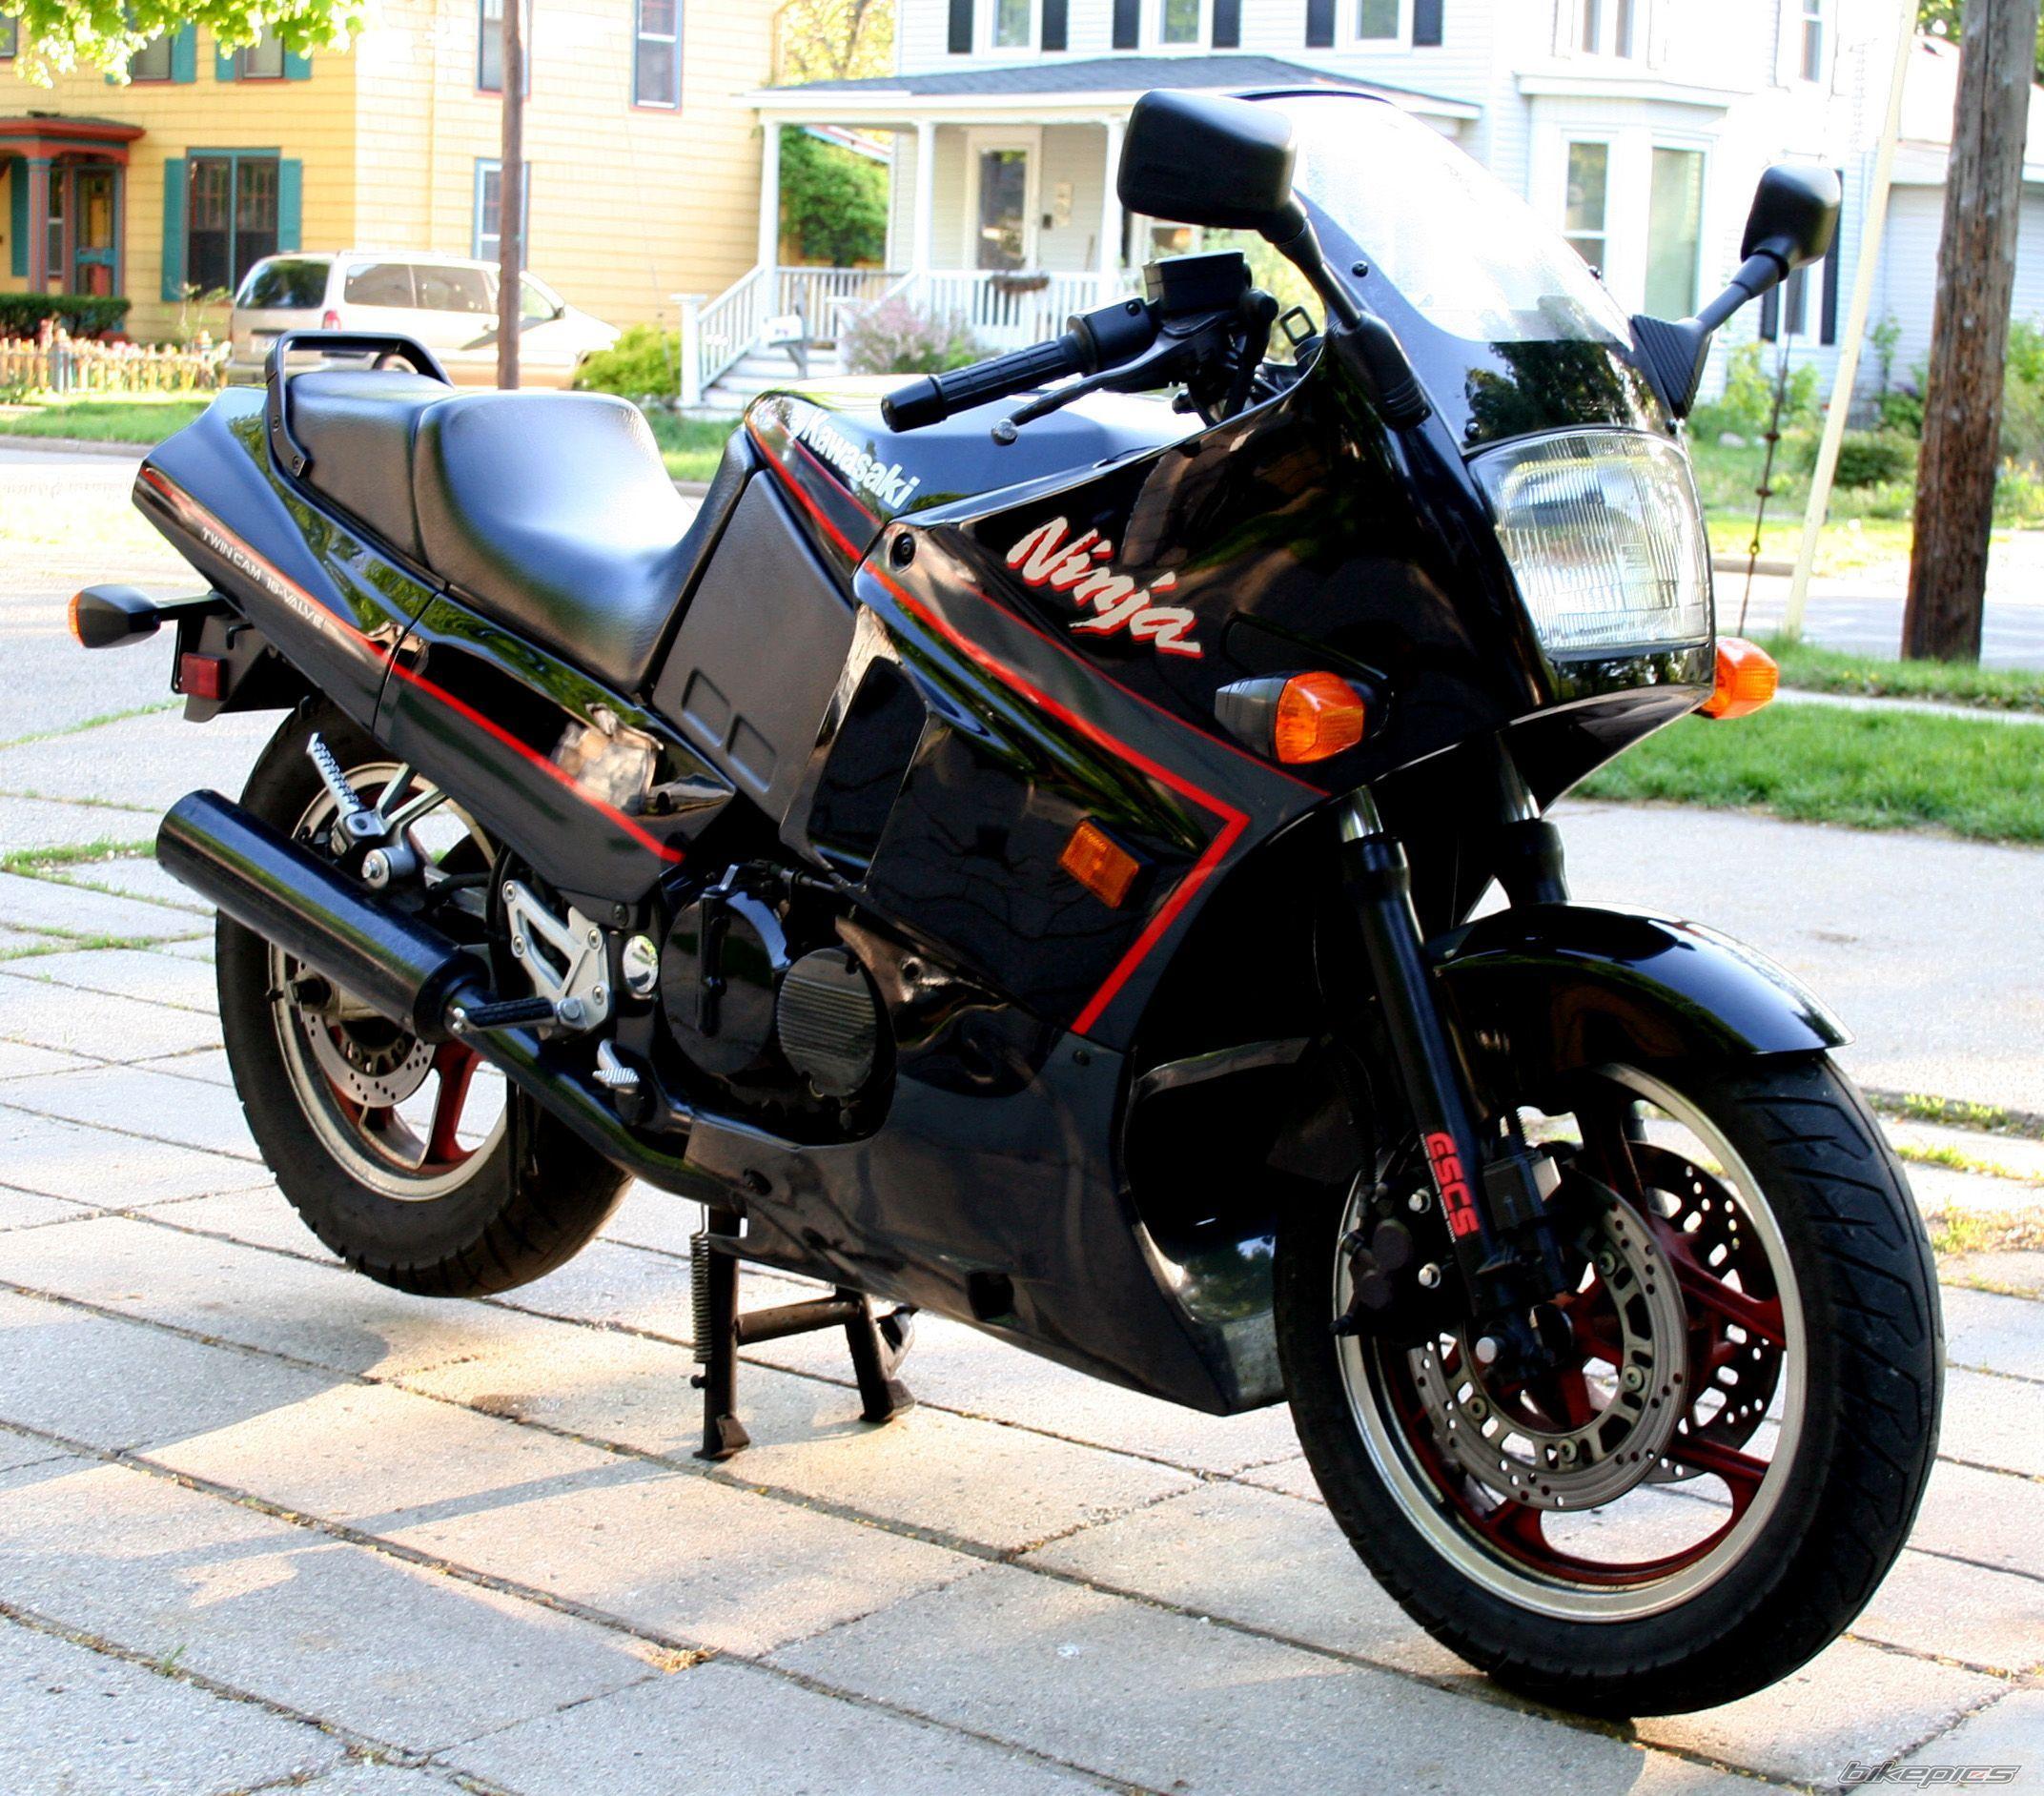 1989 Ninja 600 Related Keywords & Suggestions - 1989 Ninja 600 ...